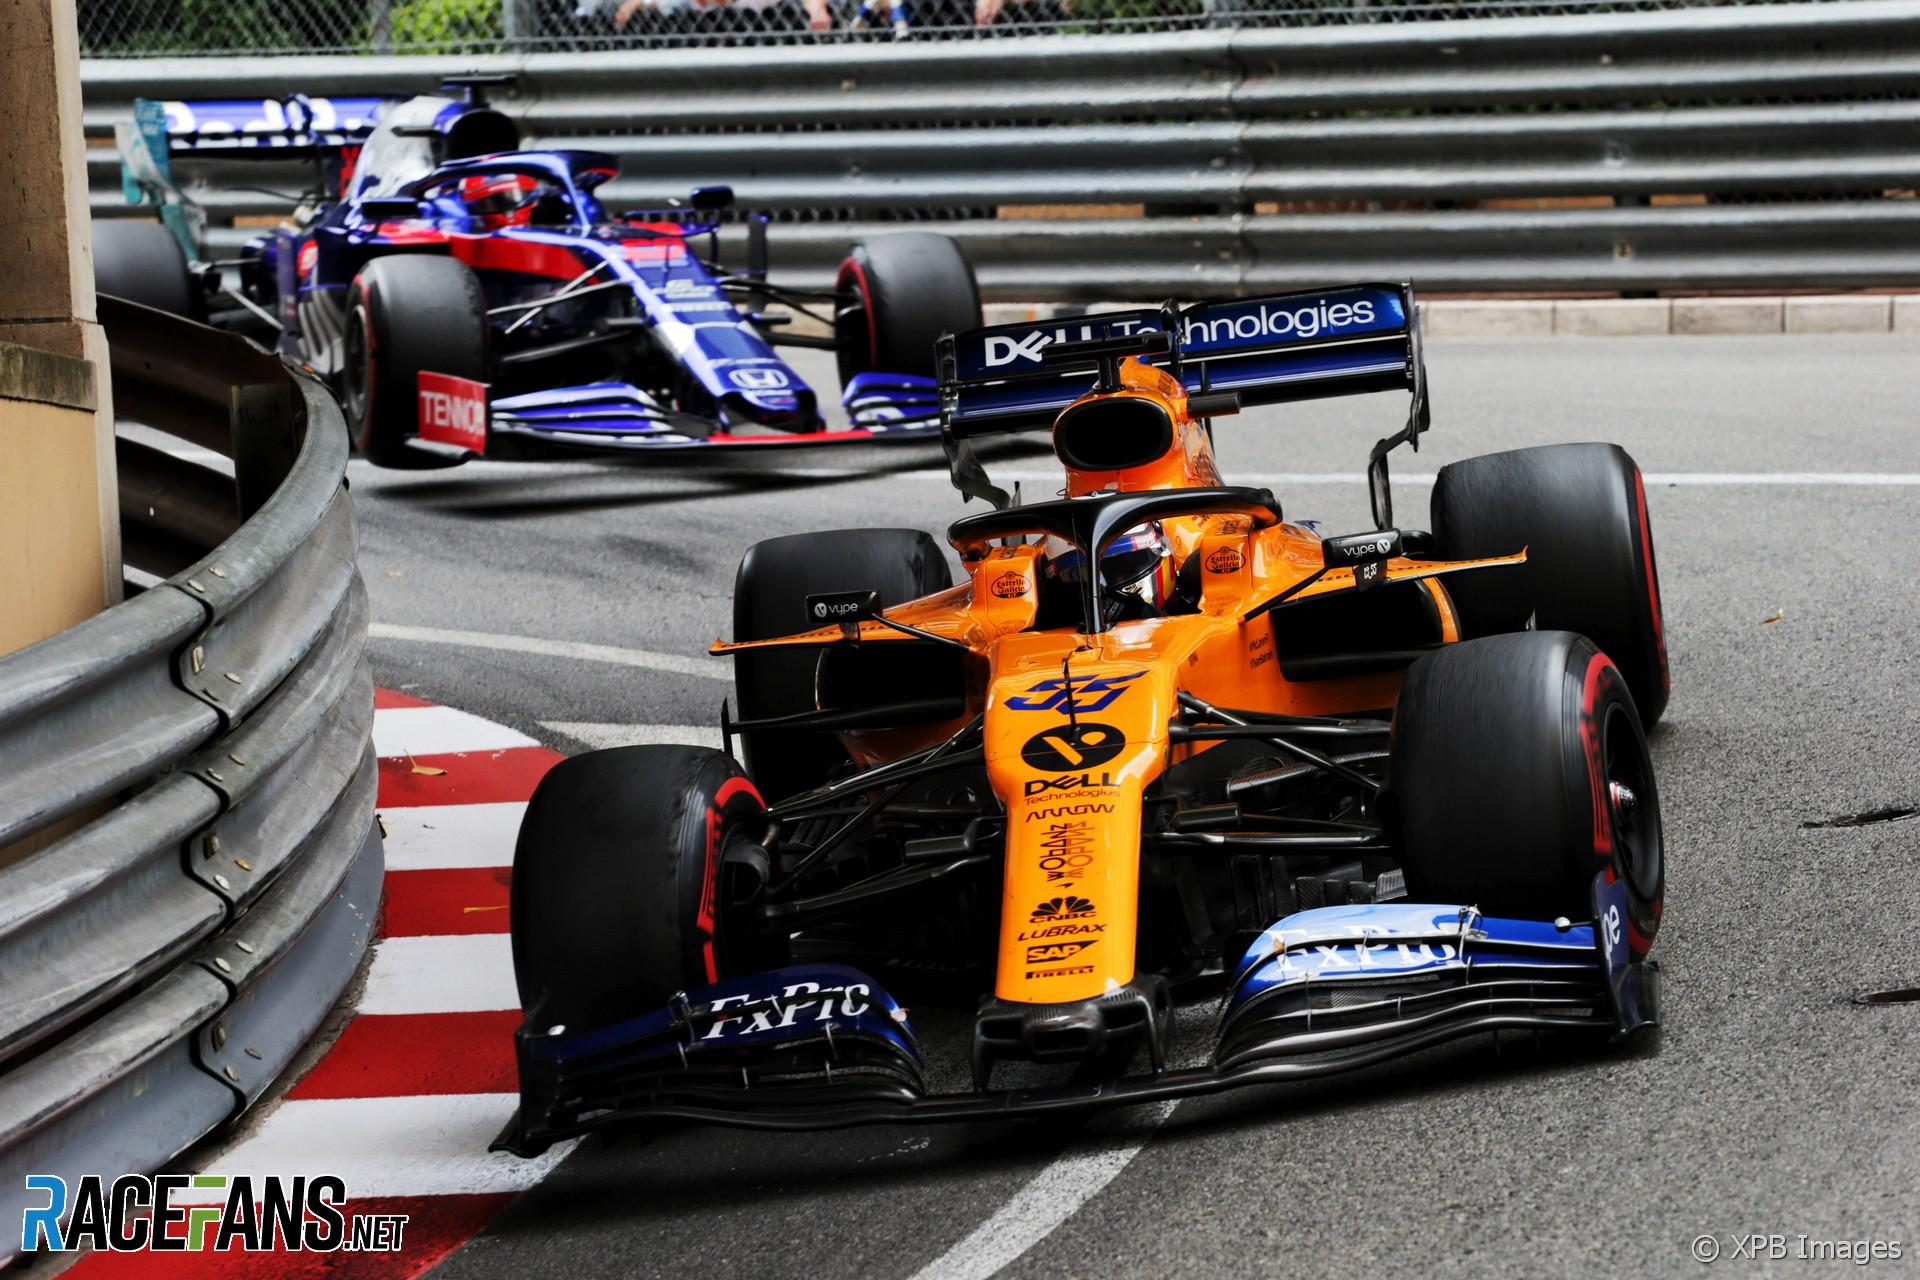 Carlos Sainz Jnr, McLaren, Monaco, 2019